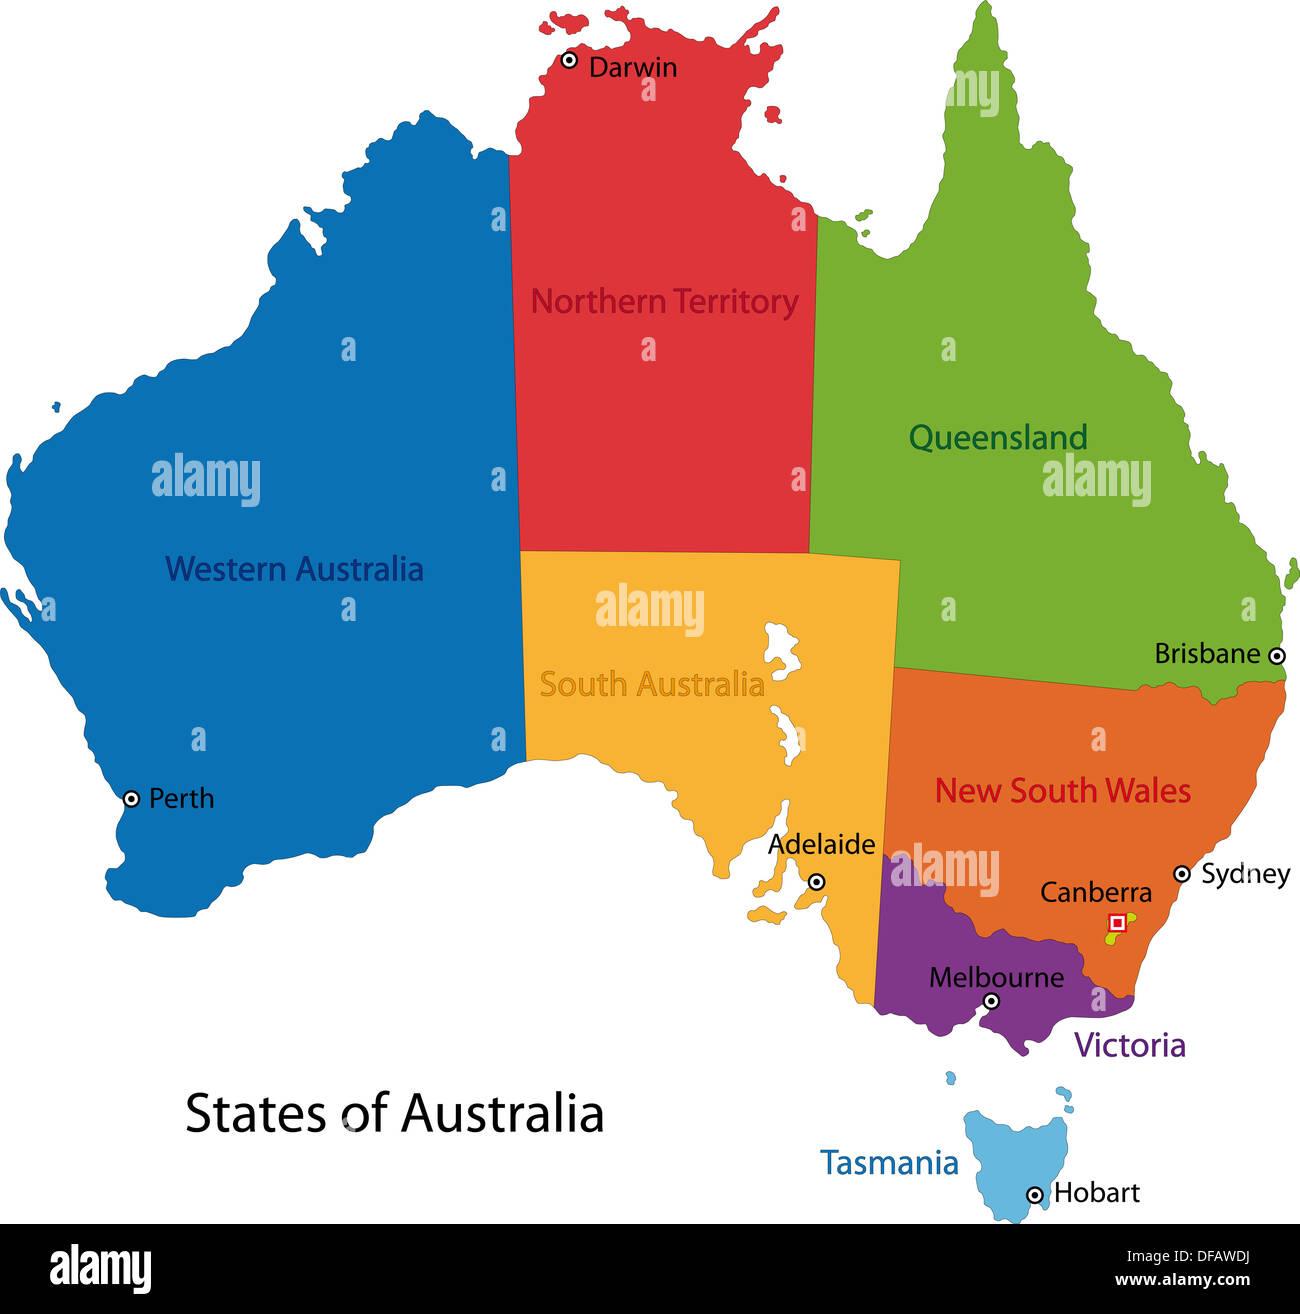 Australia map Stock Photo: 61090446 - Alamy